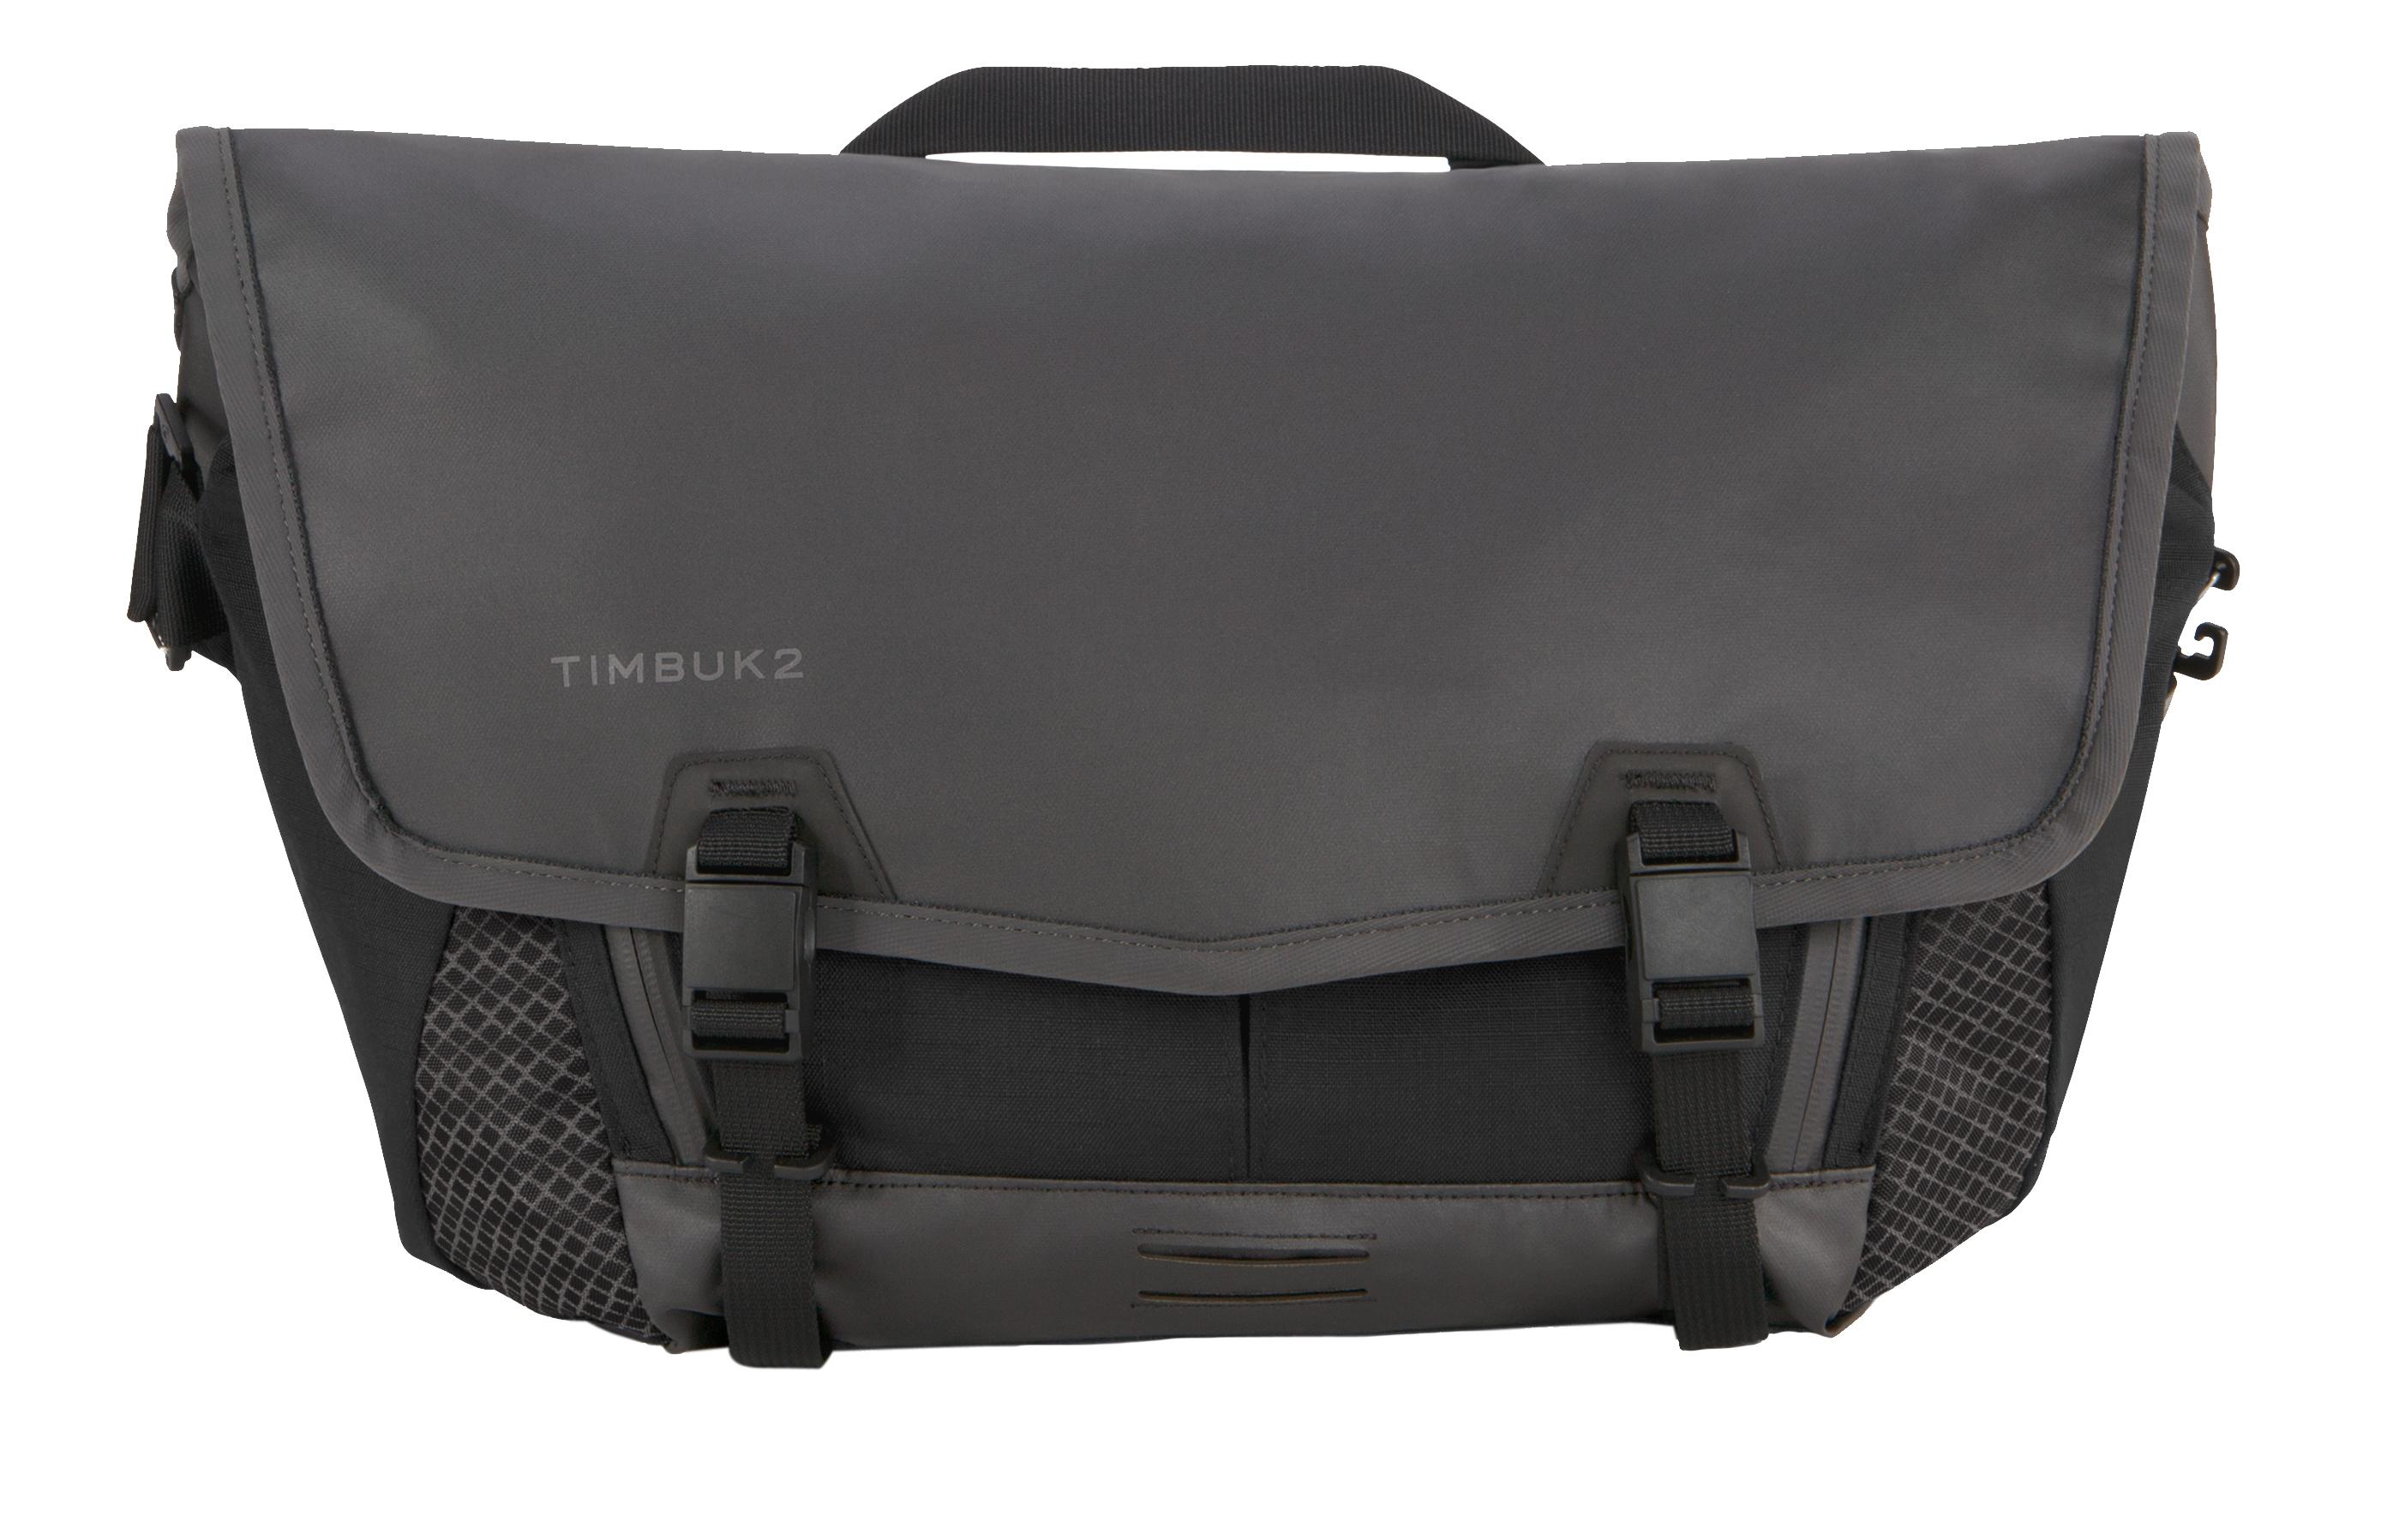 Timbuk2 Especial Messenger Bag - Unisex 82aeb18edcd92